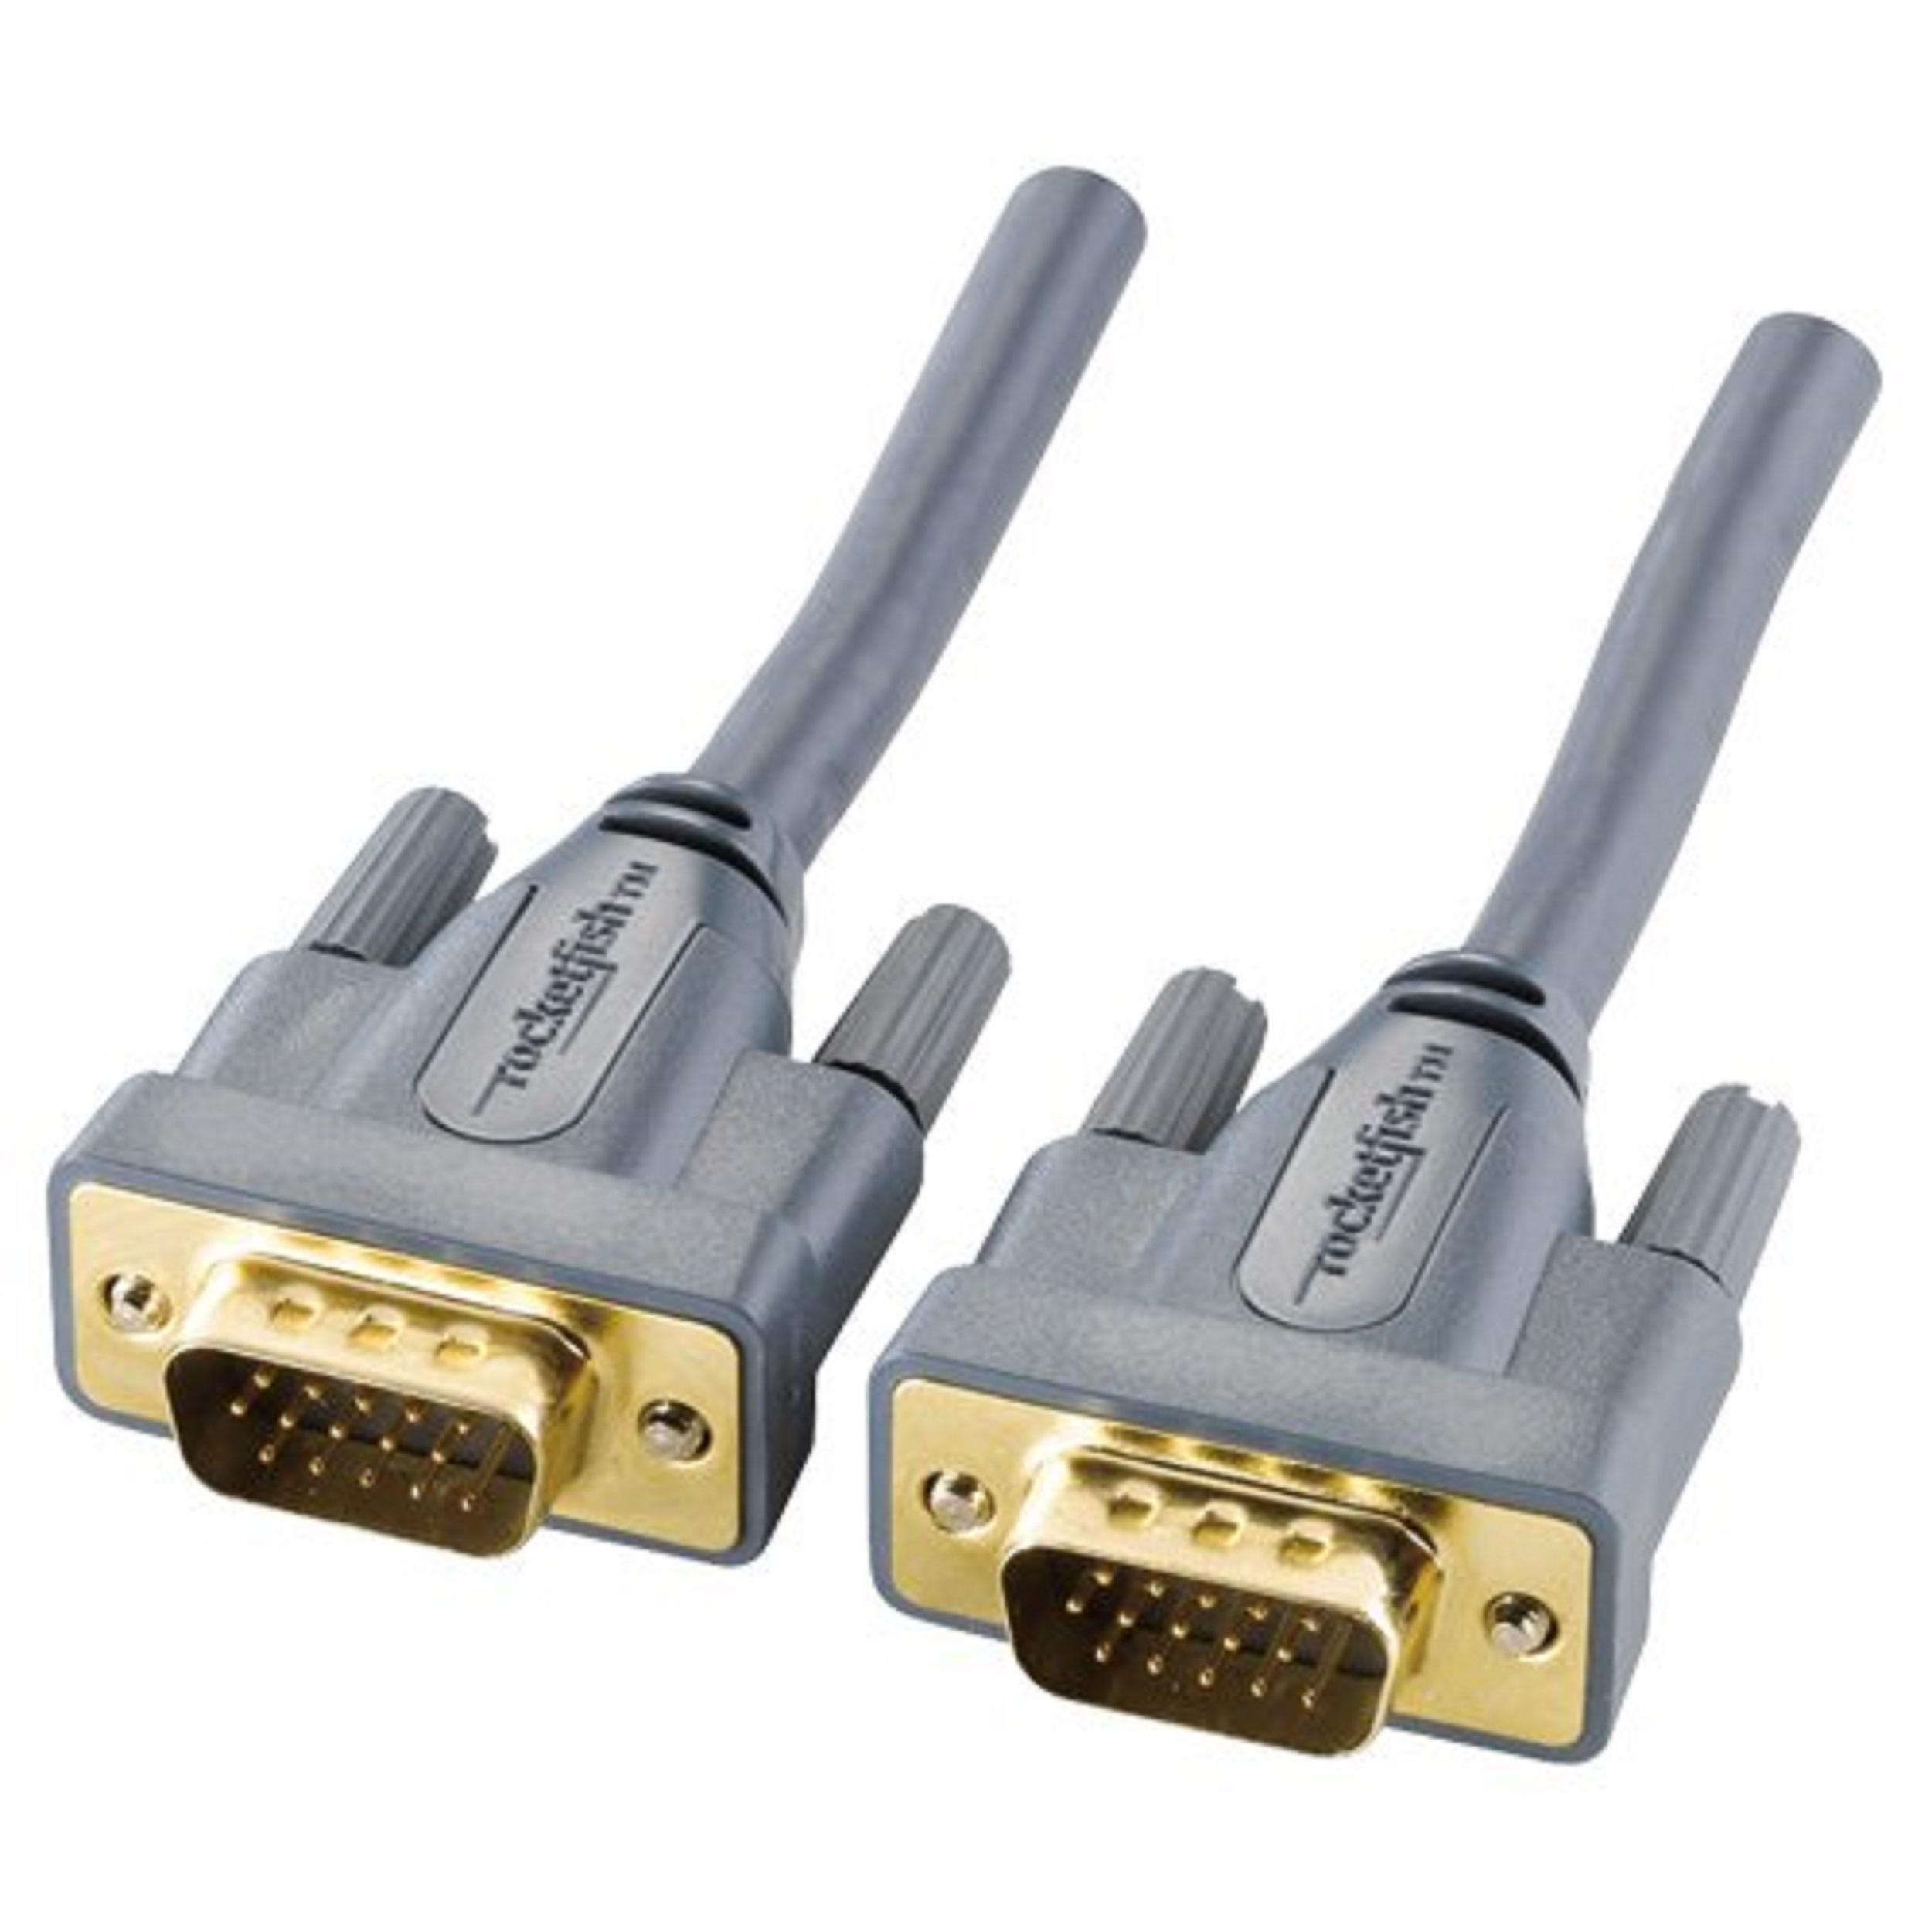 Rocketfish High-performance SVGA Cable